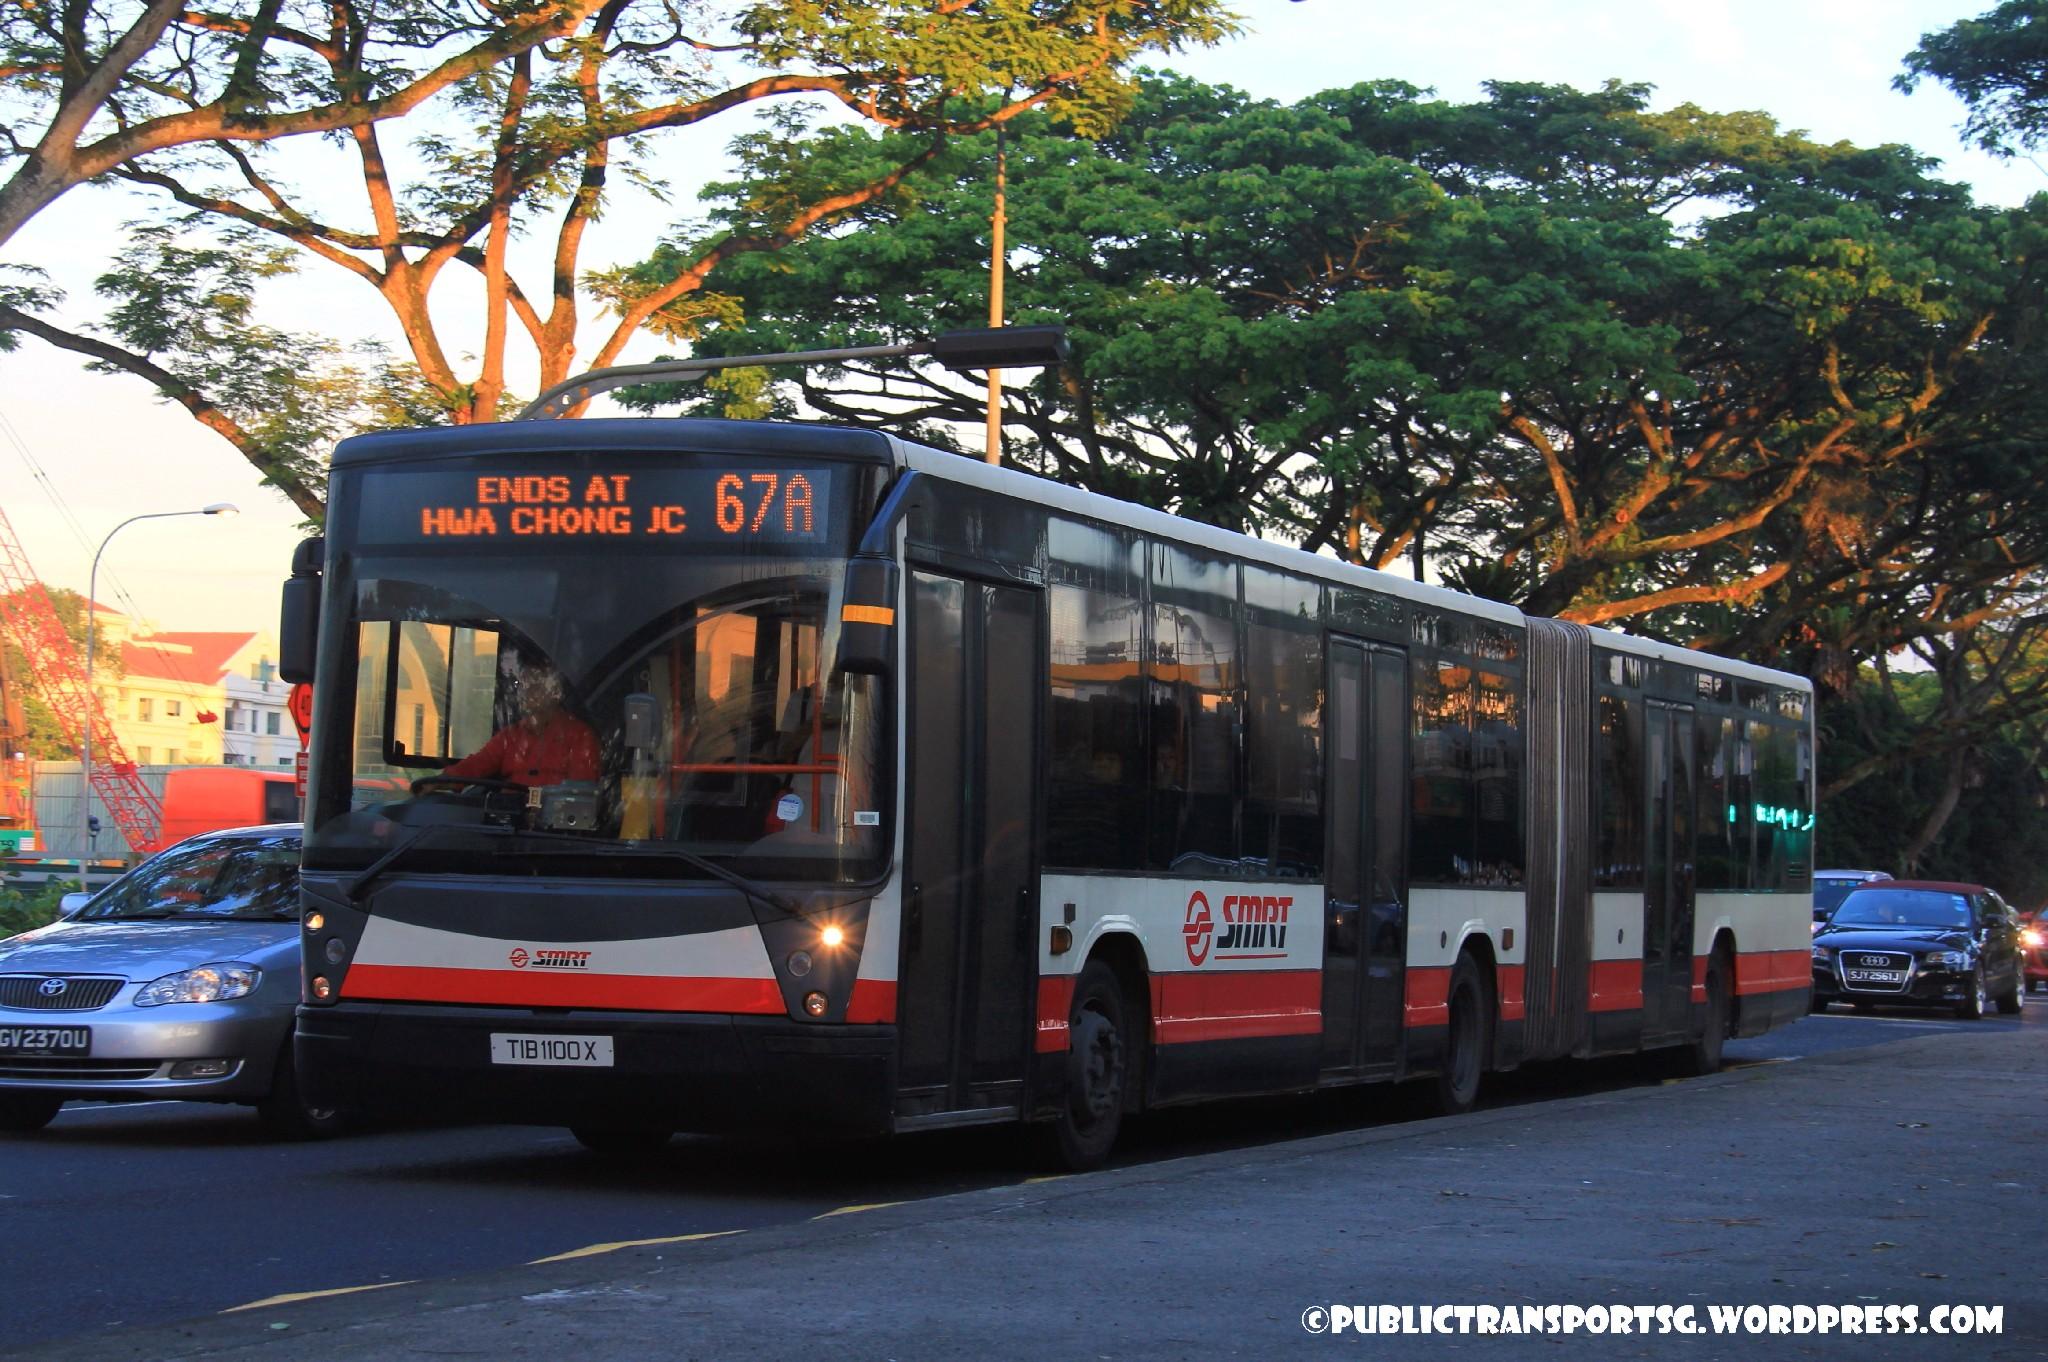 Smrt bus service 67 public transport sg for Service for mercedes benz